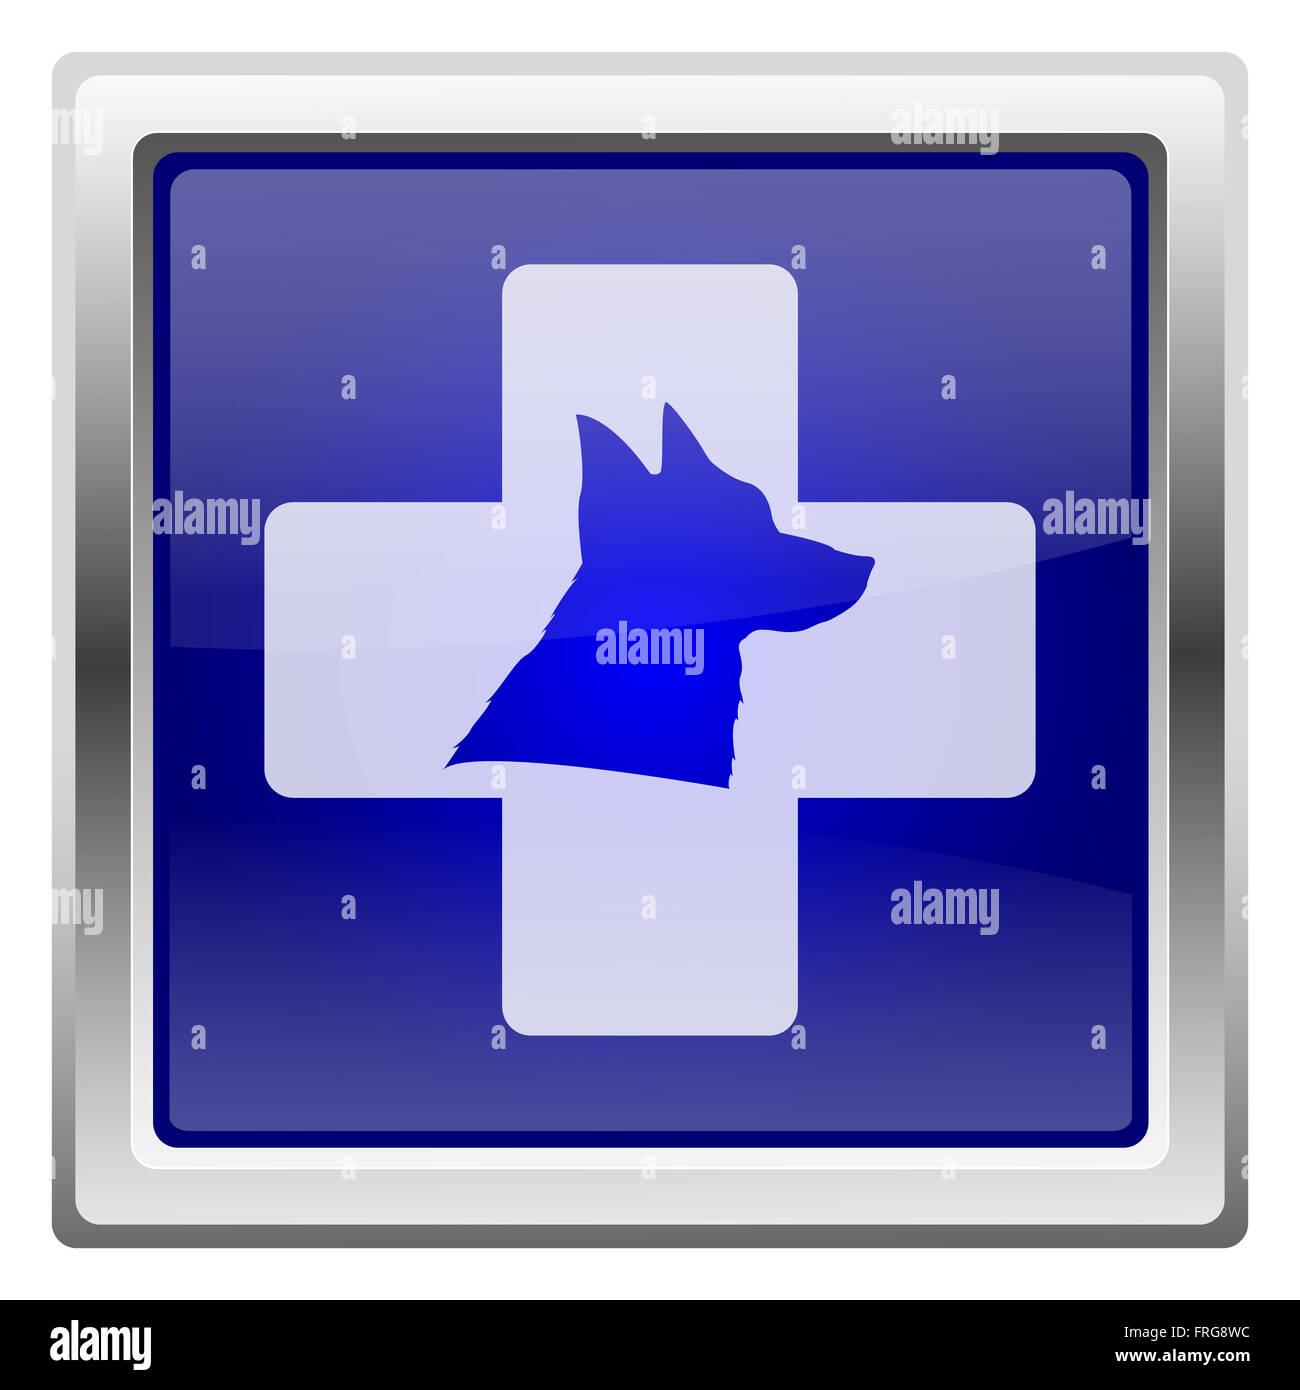 Metallic shiny icon with white design on blue background - Stock Image